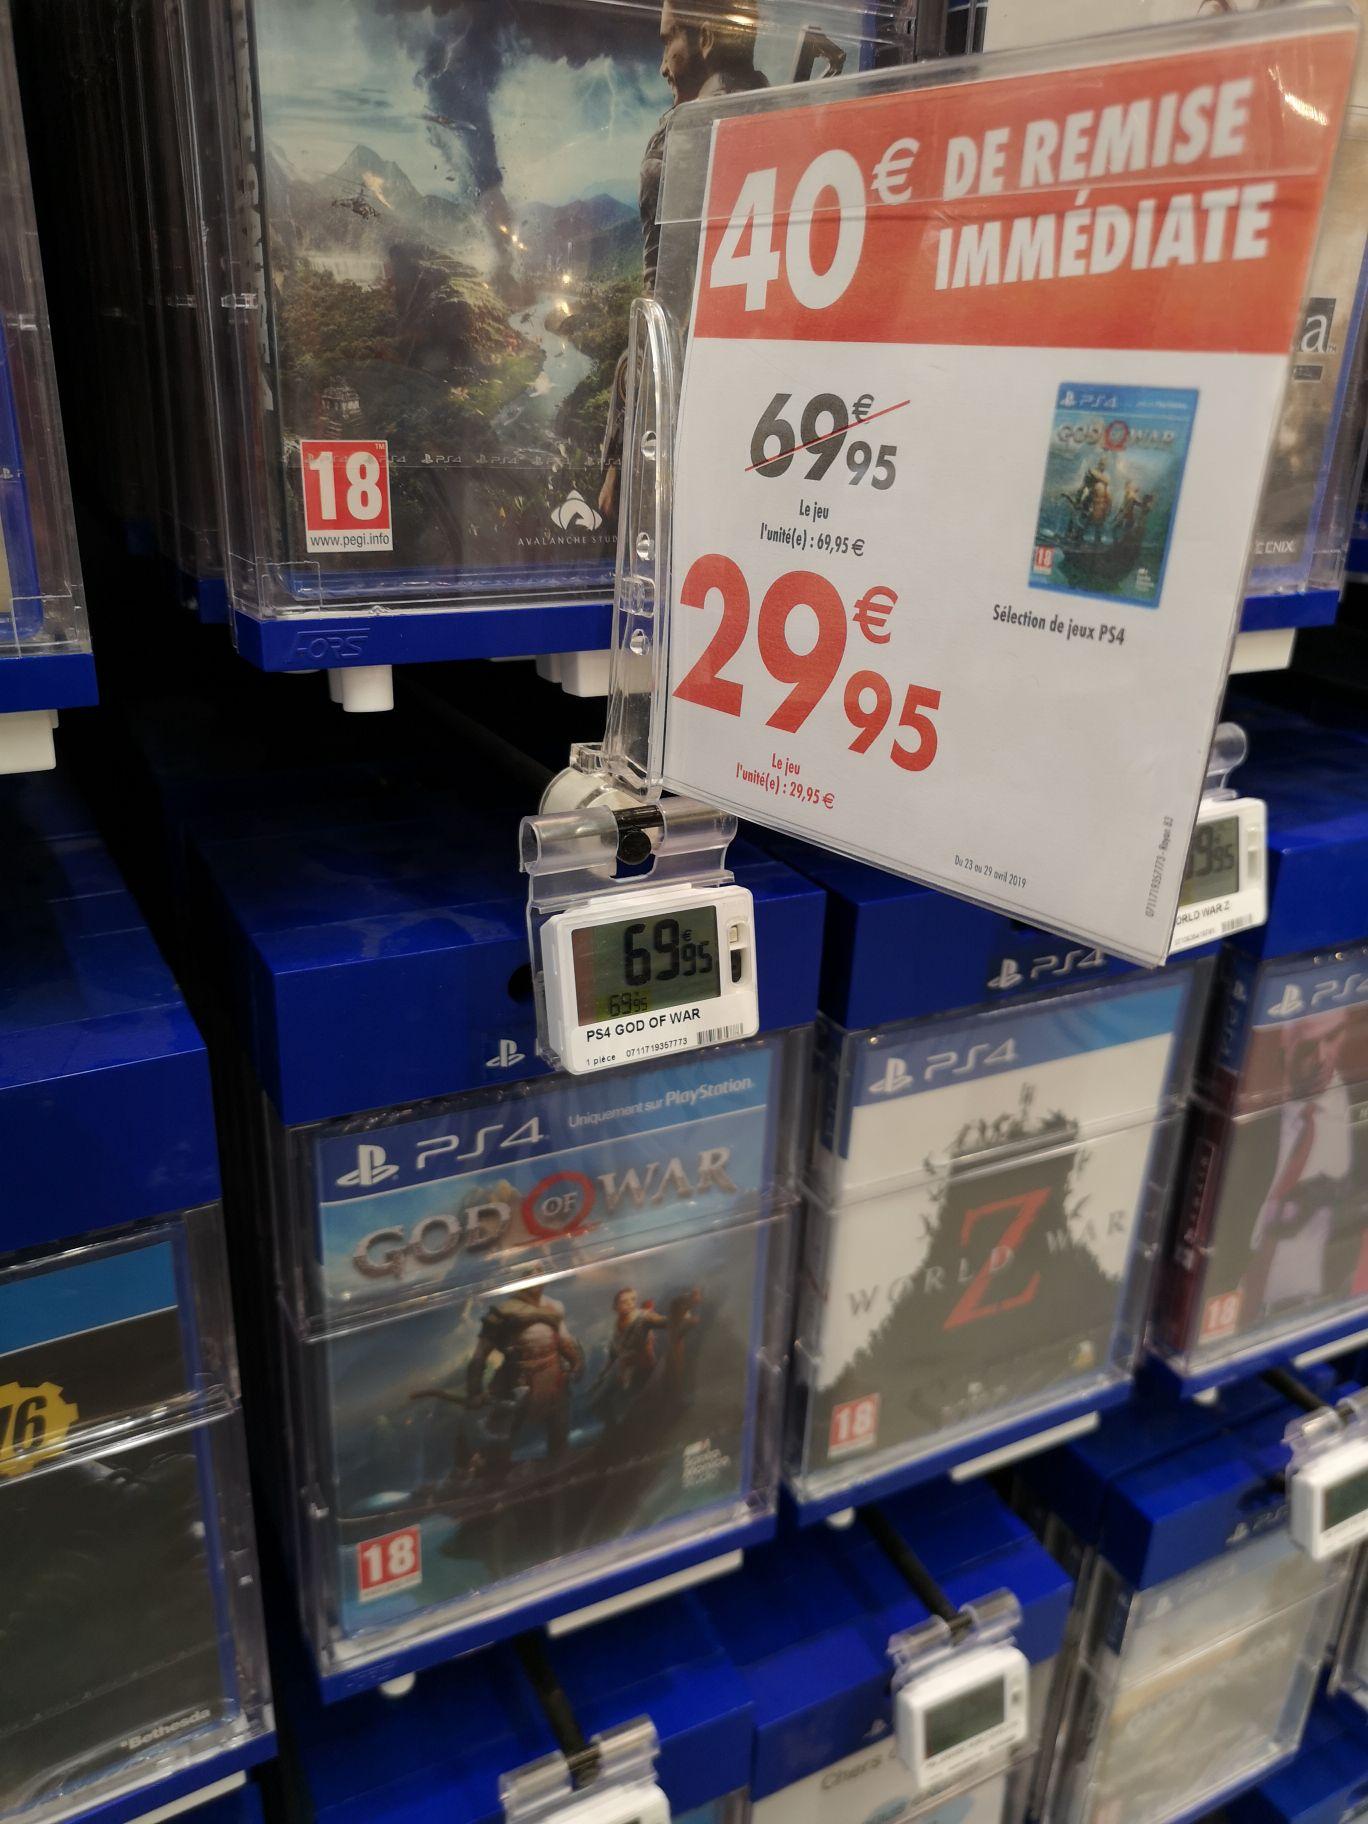 God of War sur PS4 - Les Ulis (91)